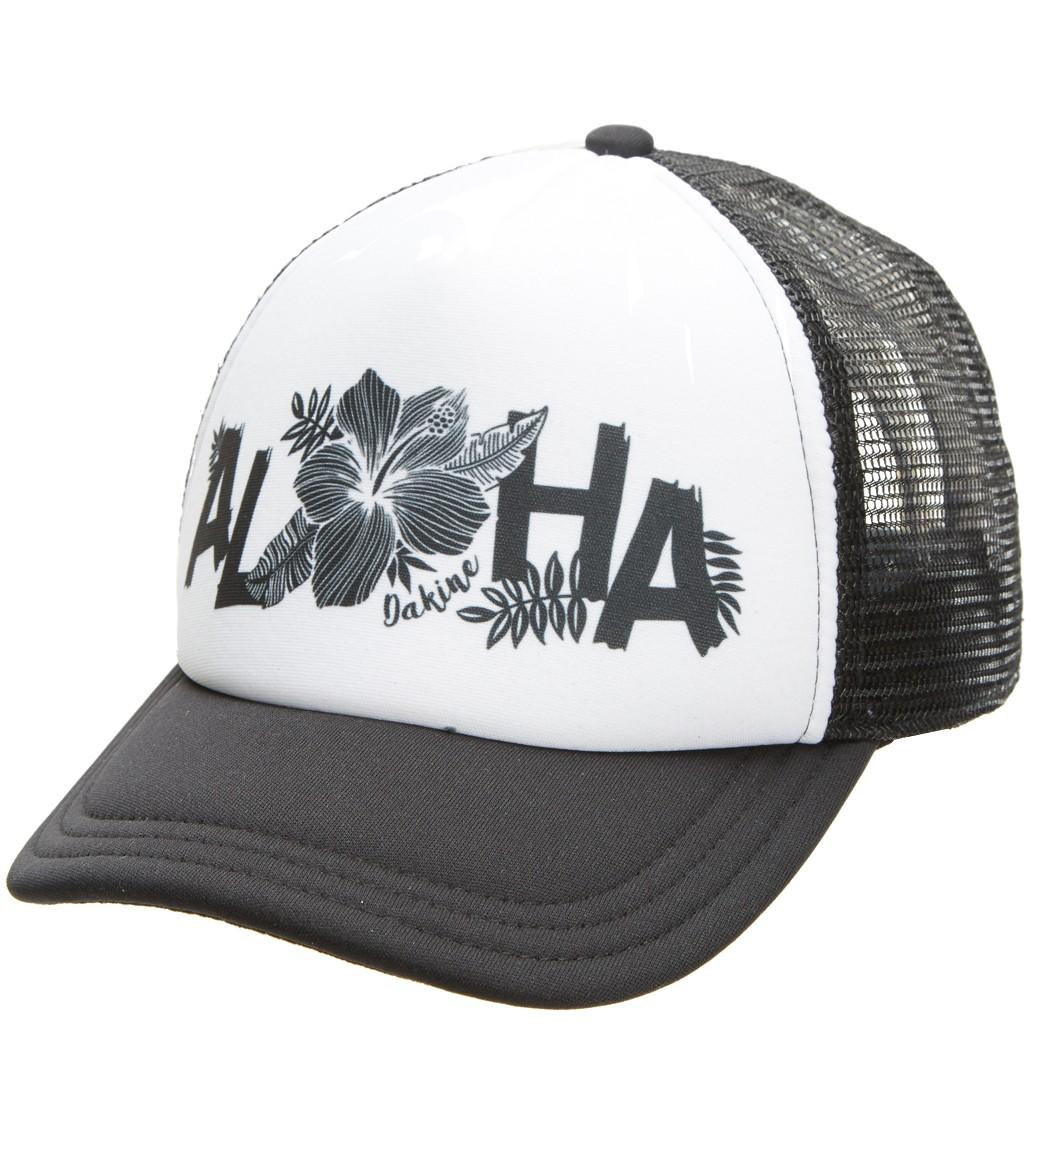 ebb73254091 Dakine Women s Aloha Trucker Hat at SwimOutlet.com